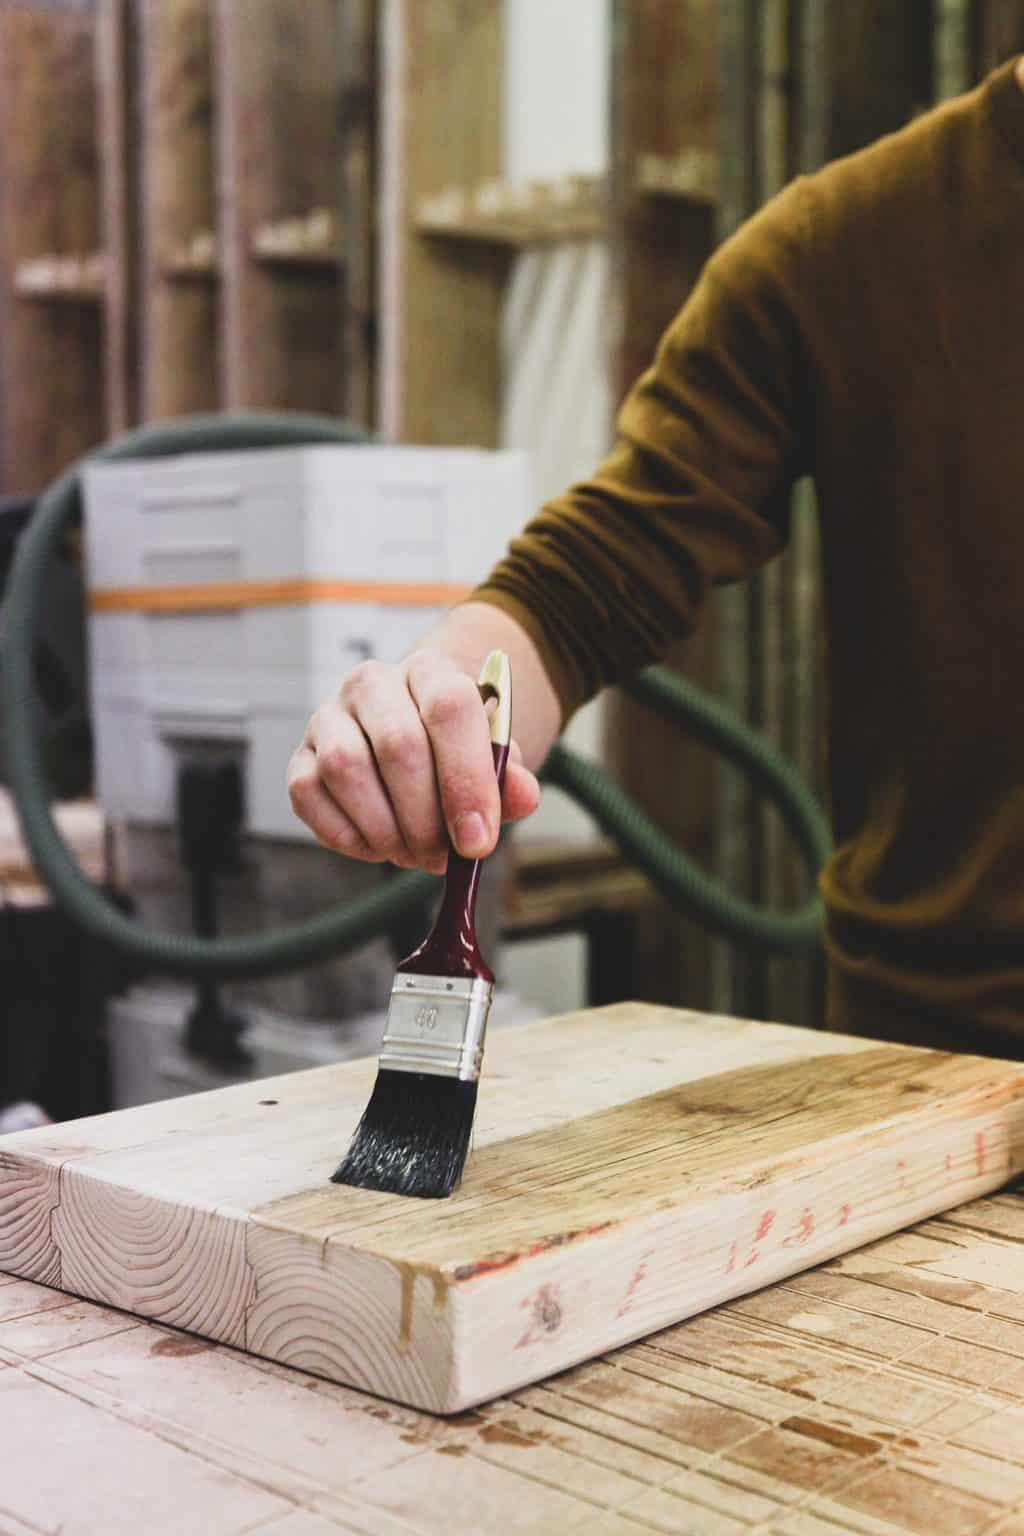 Man applying finish on a block of wood